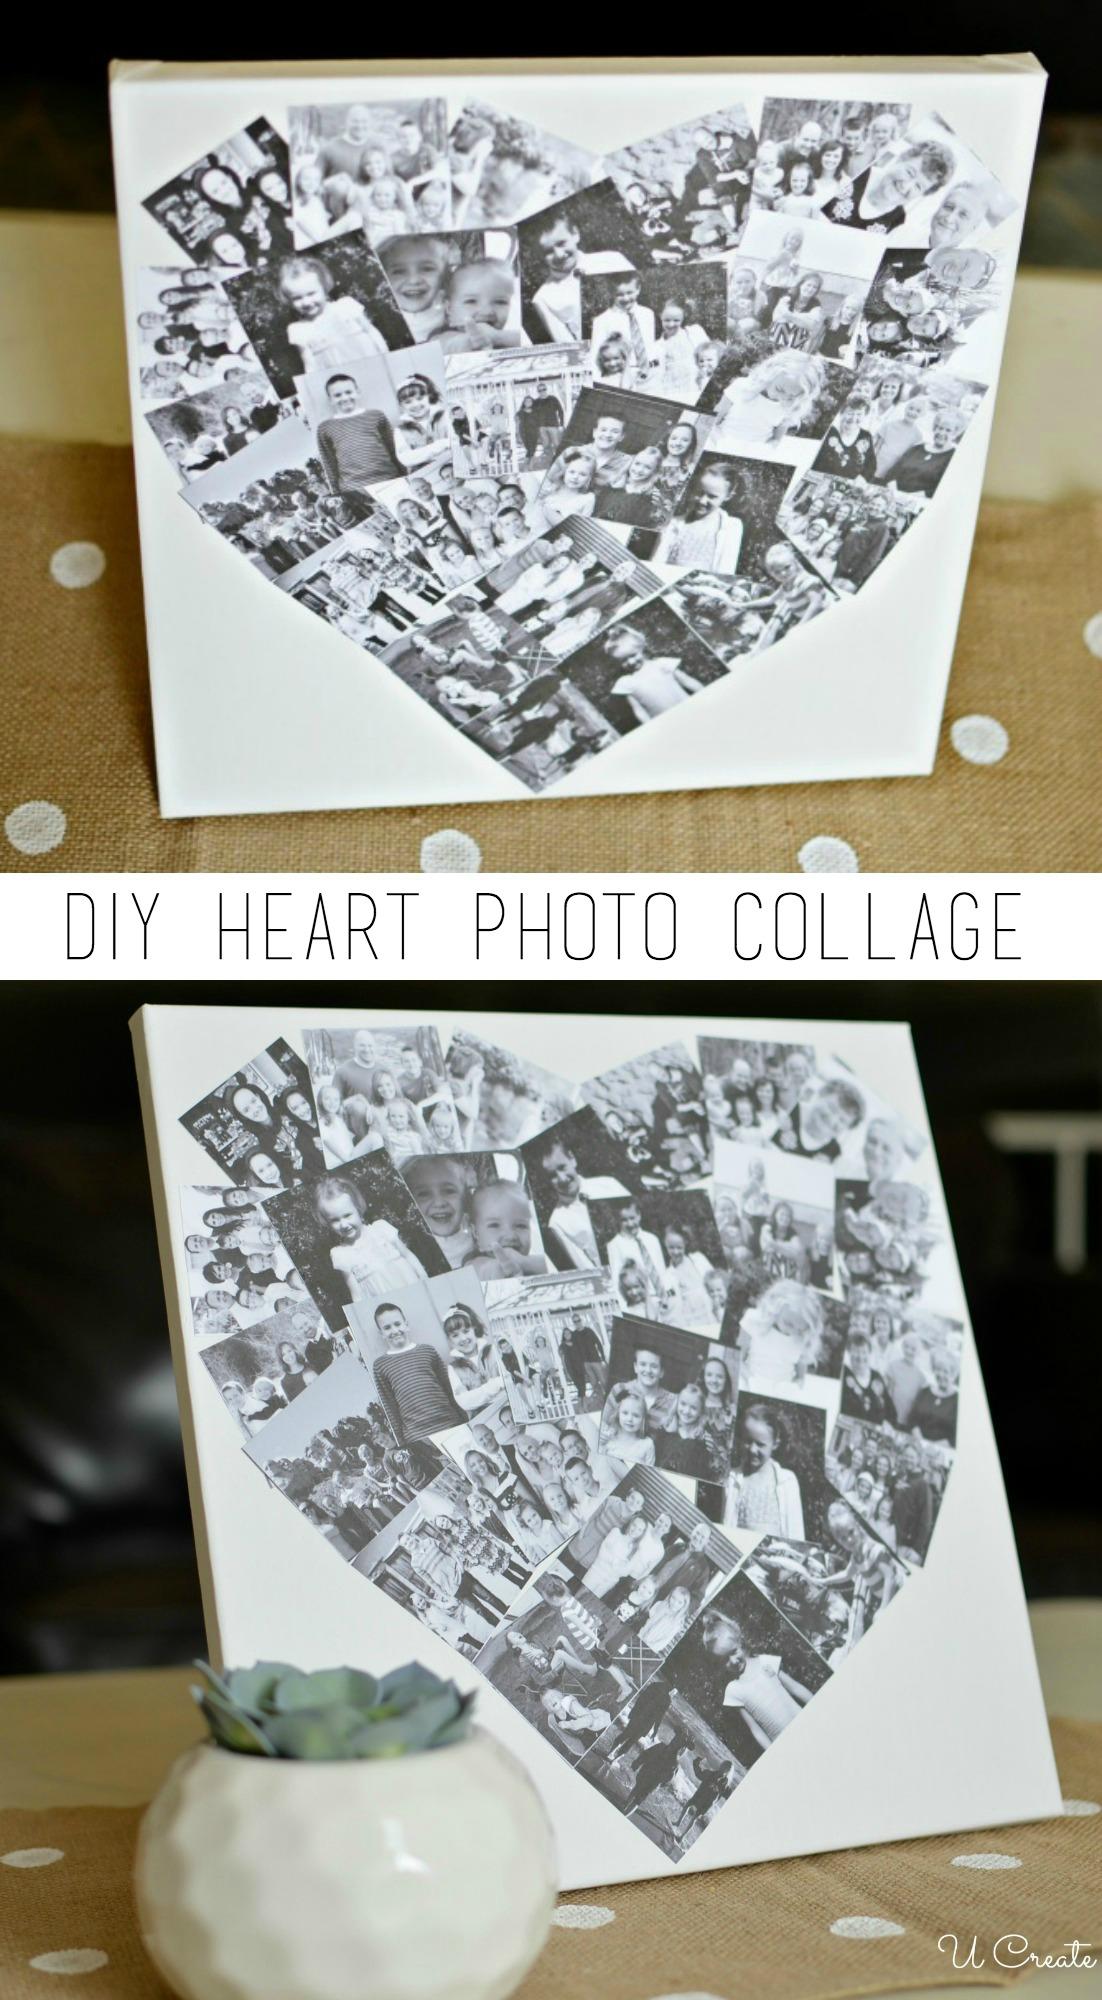 Heart Collage : heart, collage, Heart, Photo, Collage, Create